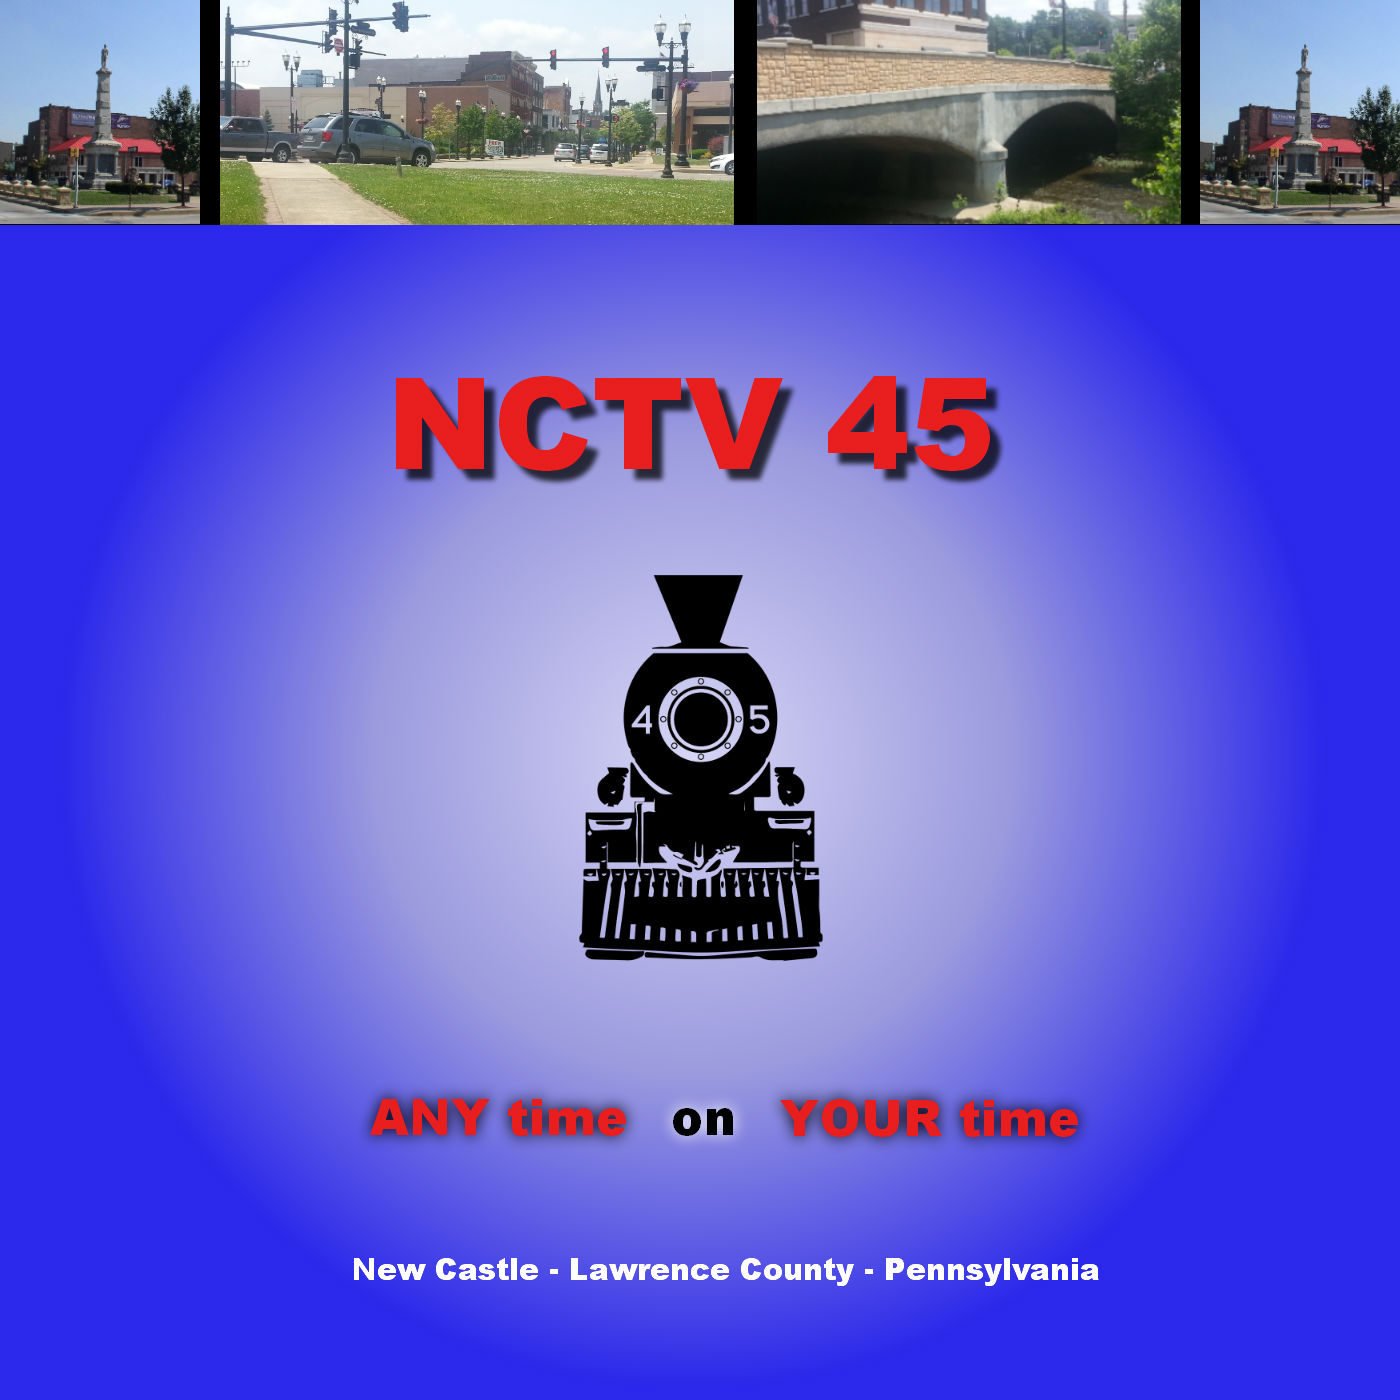 Artwork for NCTV45 Presents Beaver/Lawrence Semi Pro BaseBall: Castlewood Vs DowntownJacks 20180707